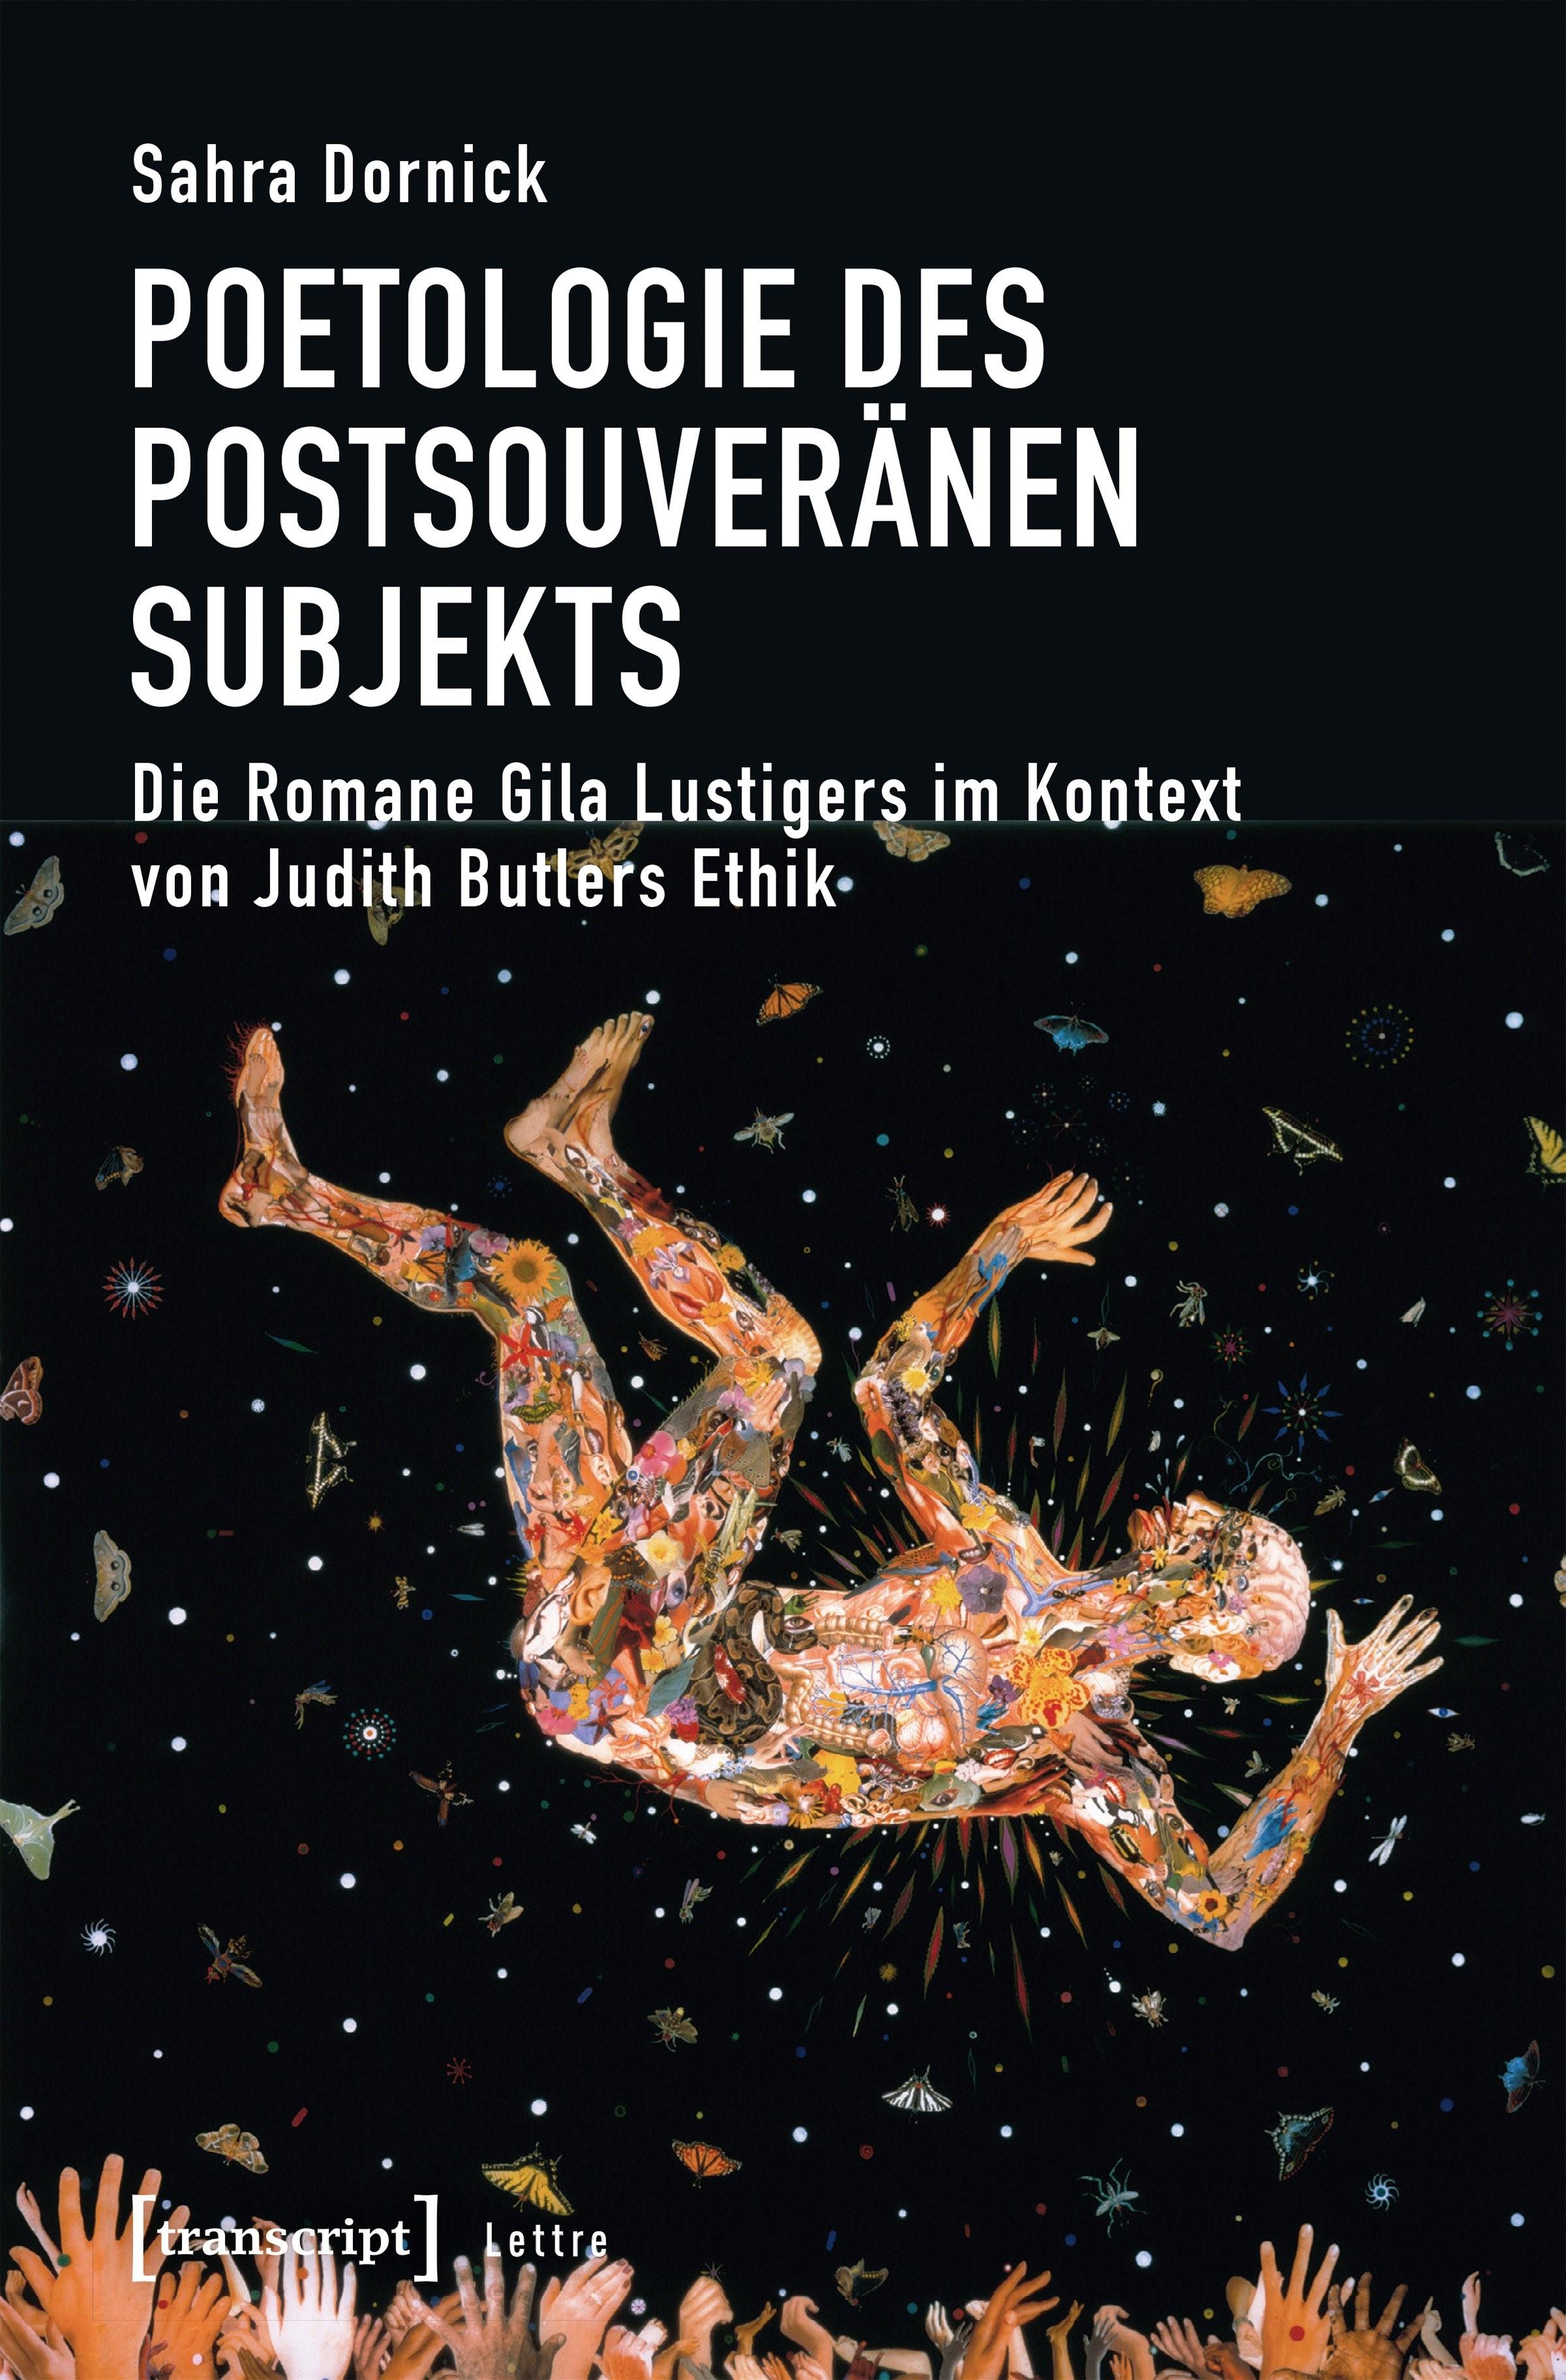 Abbildung von Dornick | Poetologie des postsouveränen Subjekts | 2019